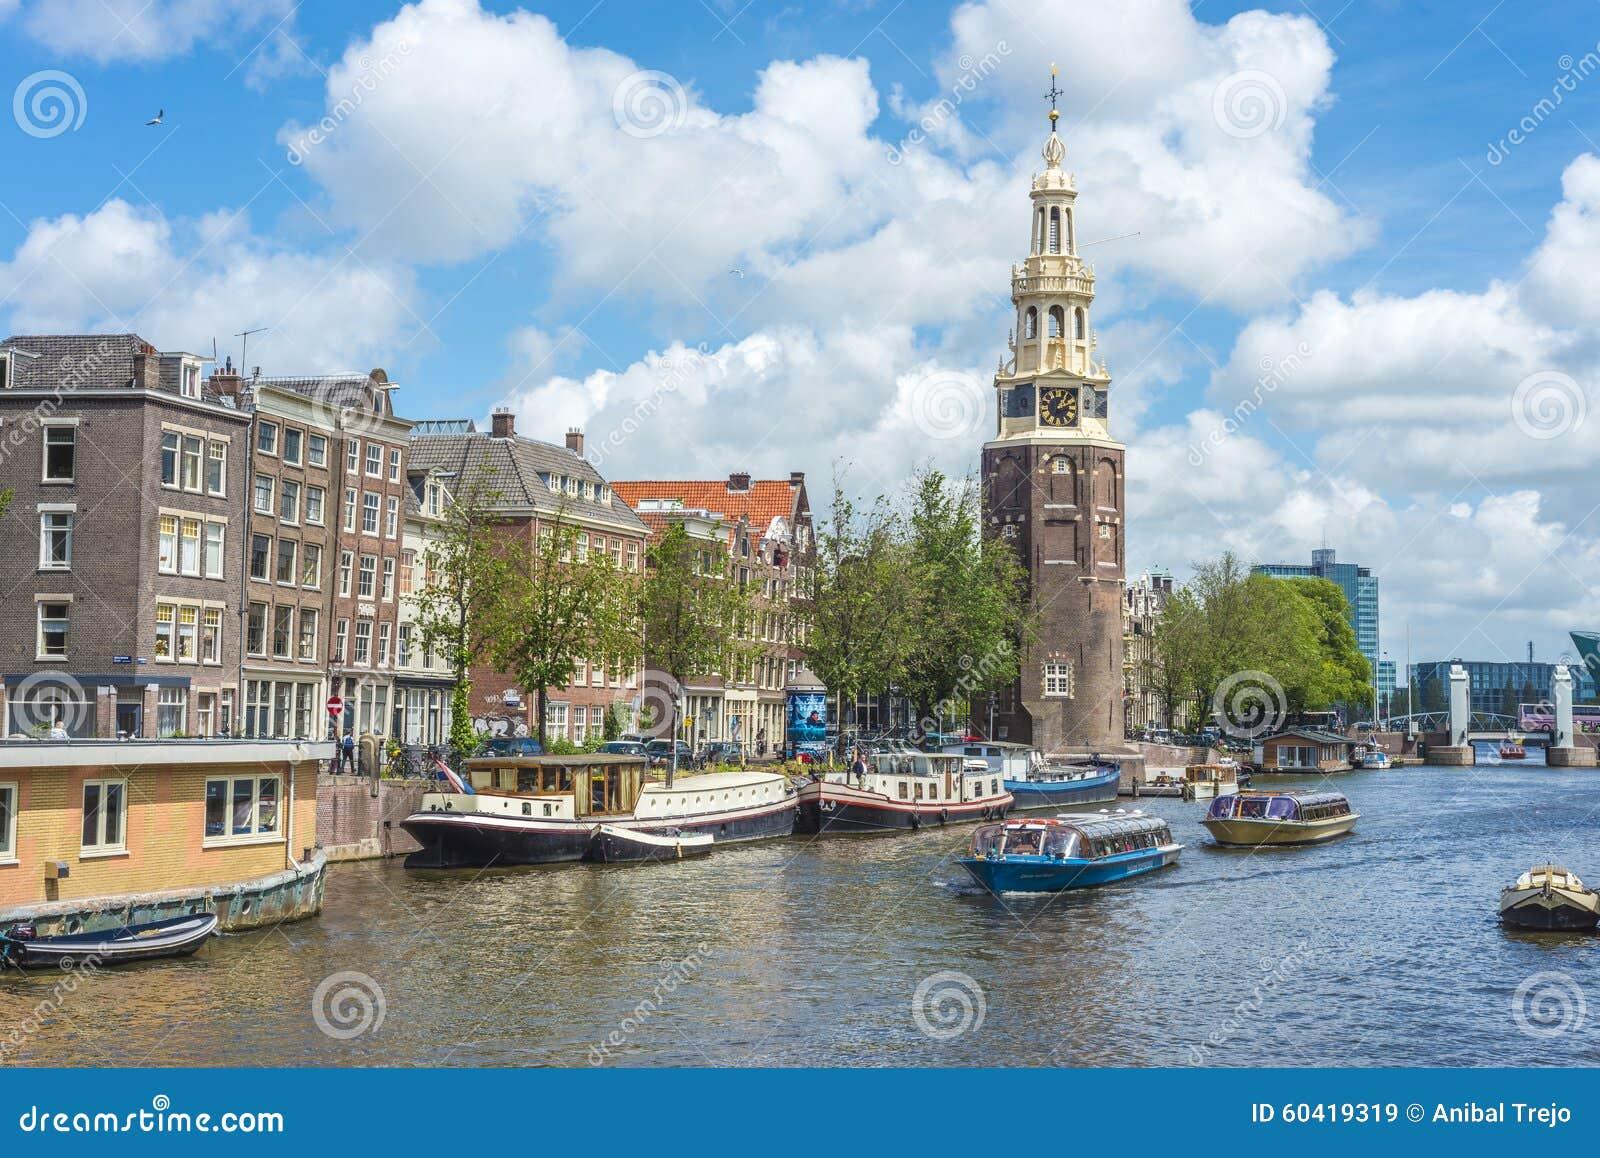 Montelbaanstoren塔在阿姆斯特丹,荷兰